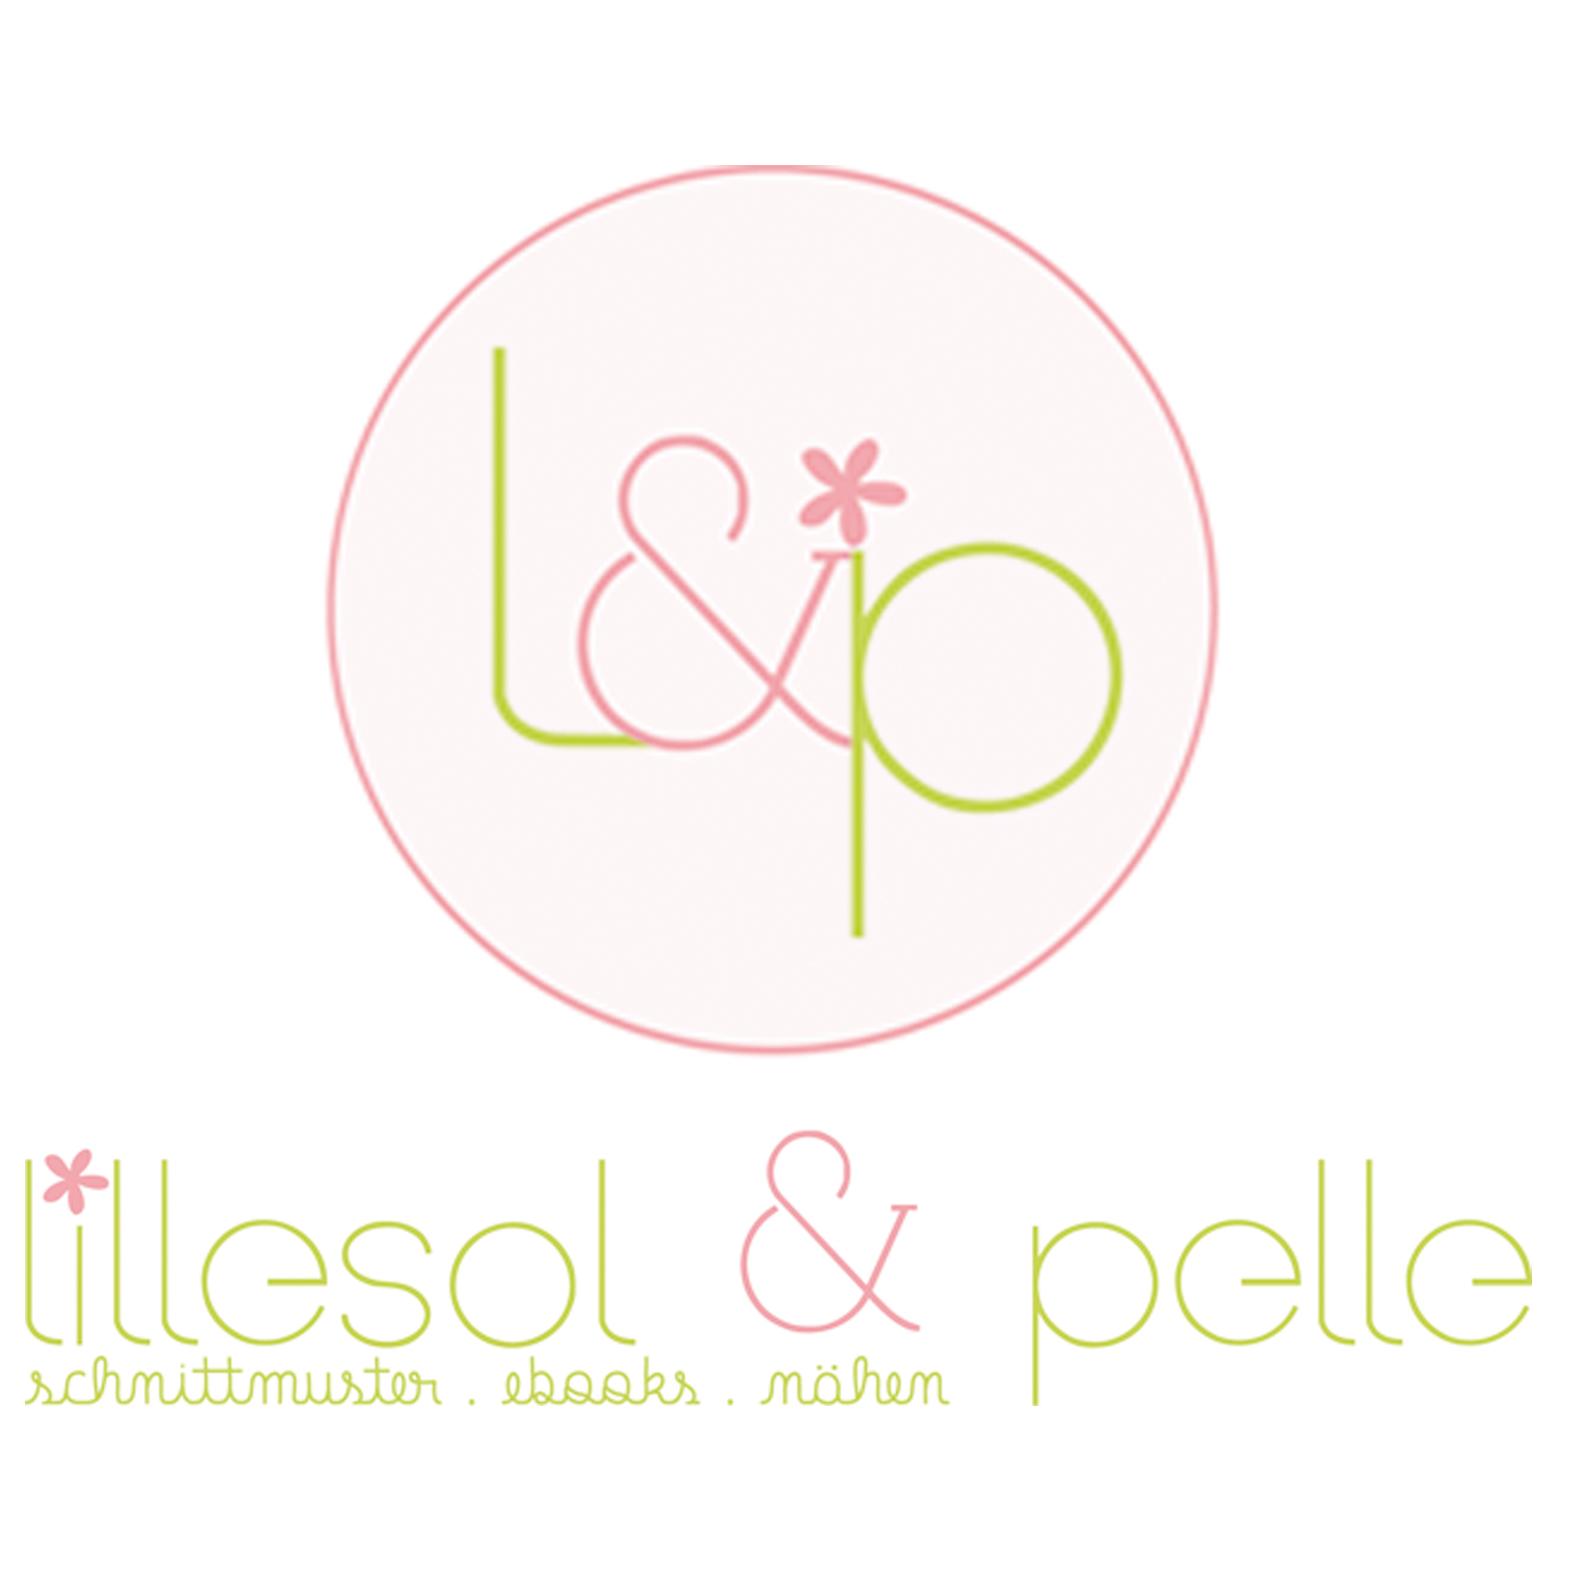 lillesol&pelle